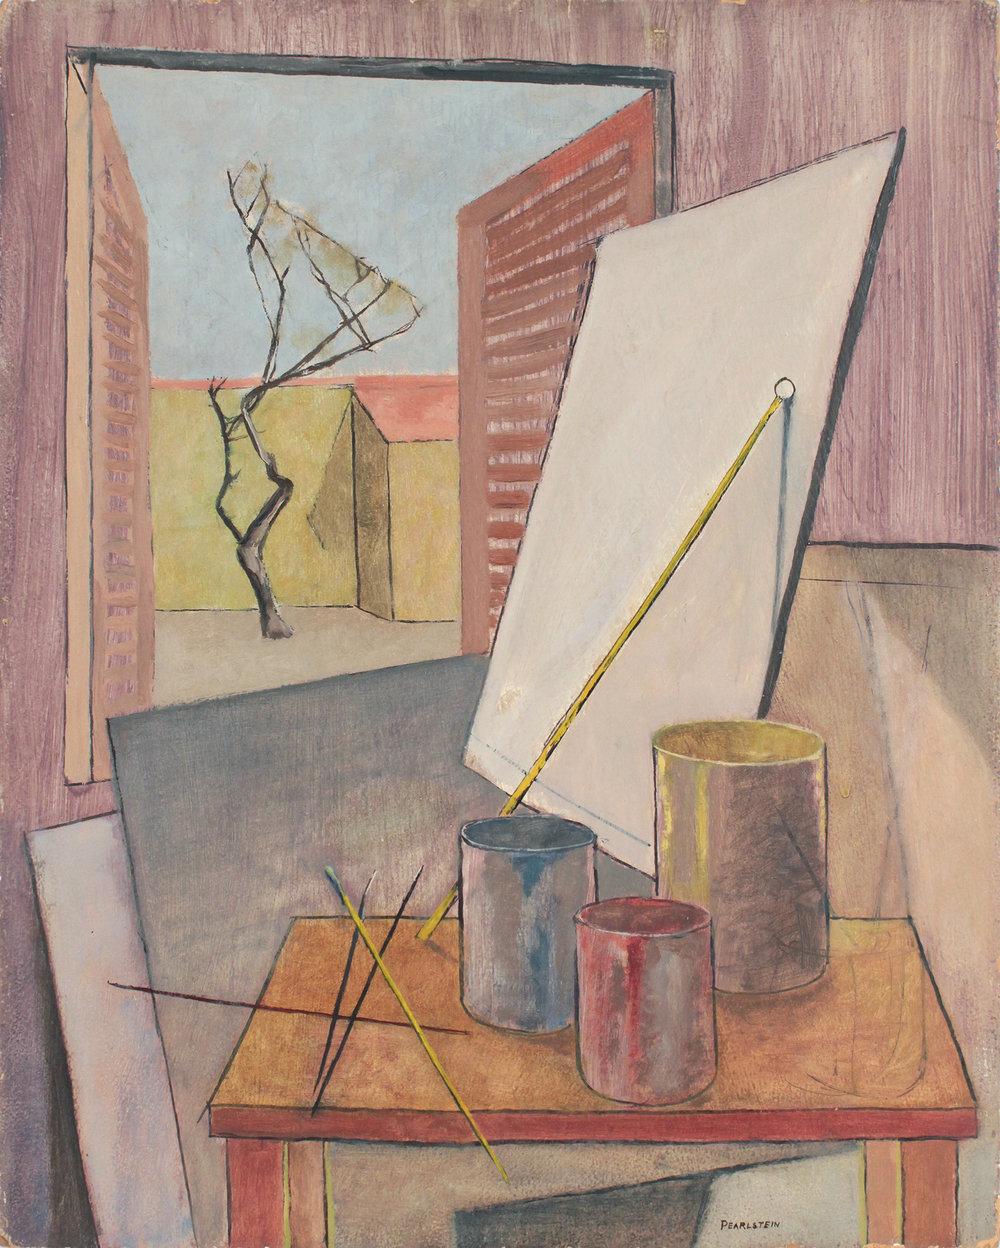 17. 1946-47 c, Still Life, Sign Shop in Italy, Oil on Board, 20x16, PPS 1554.JPG